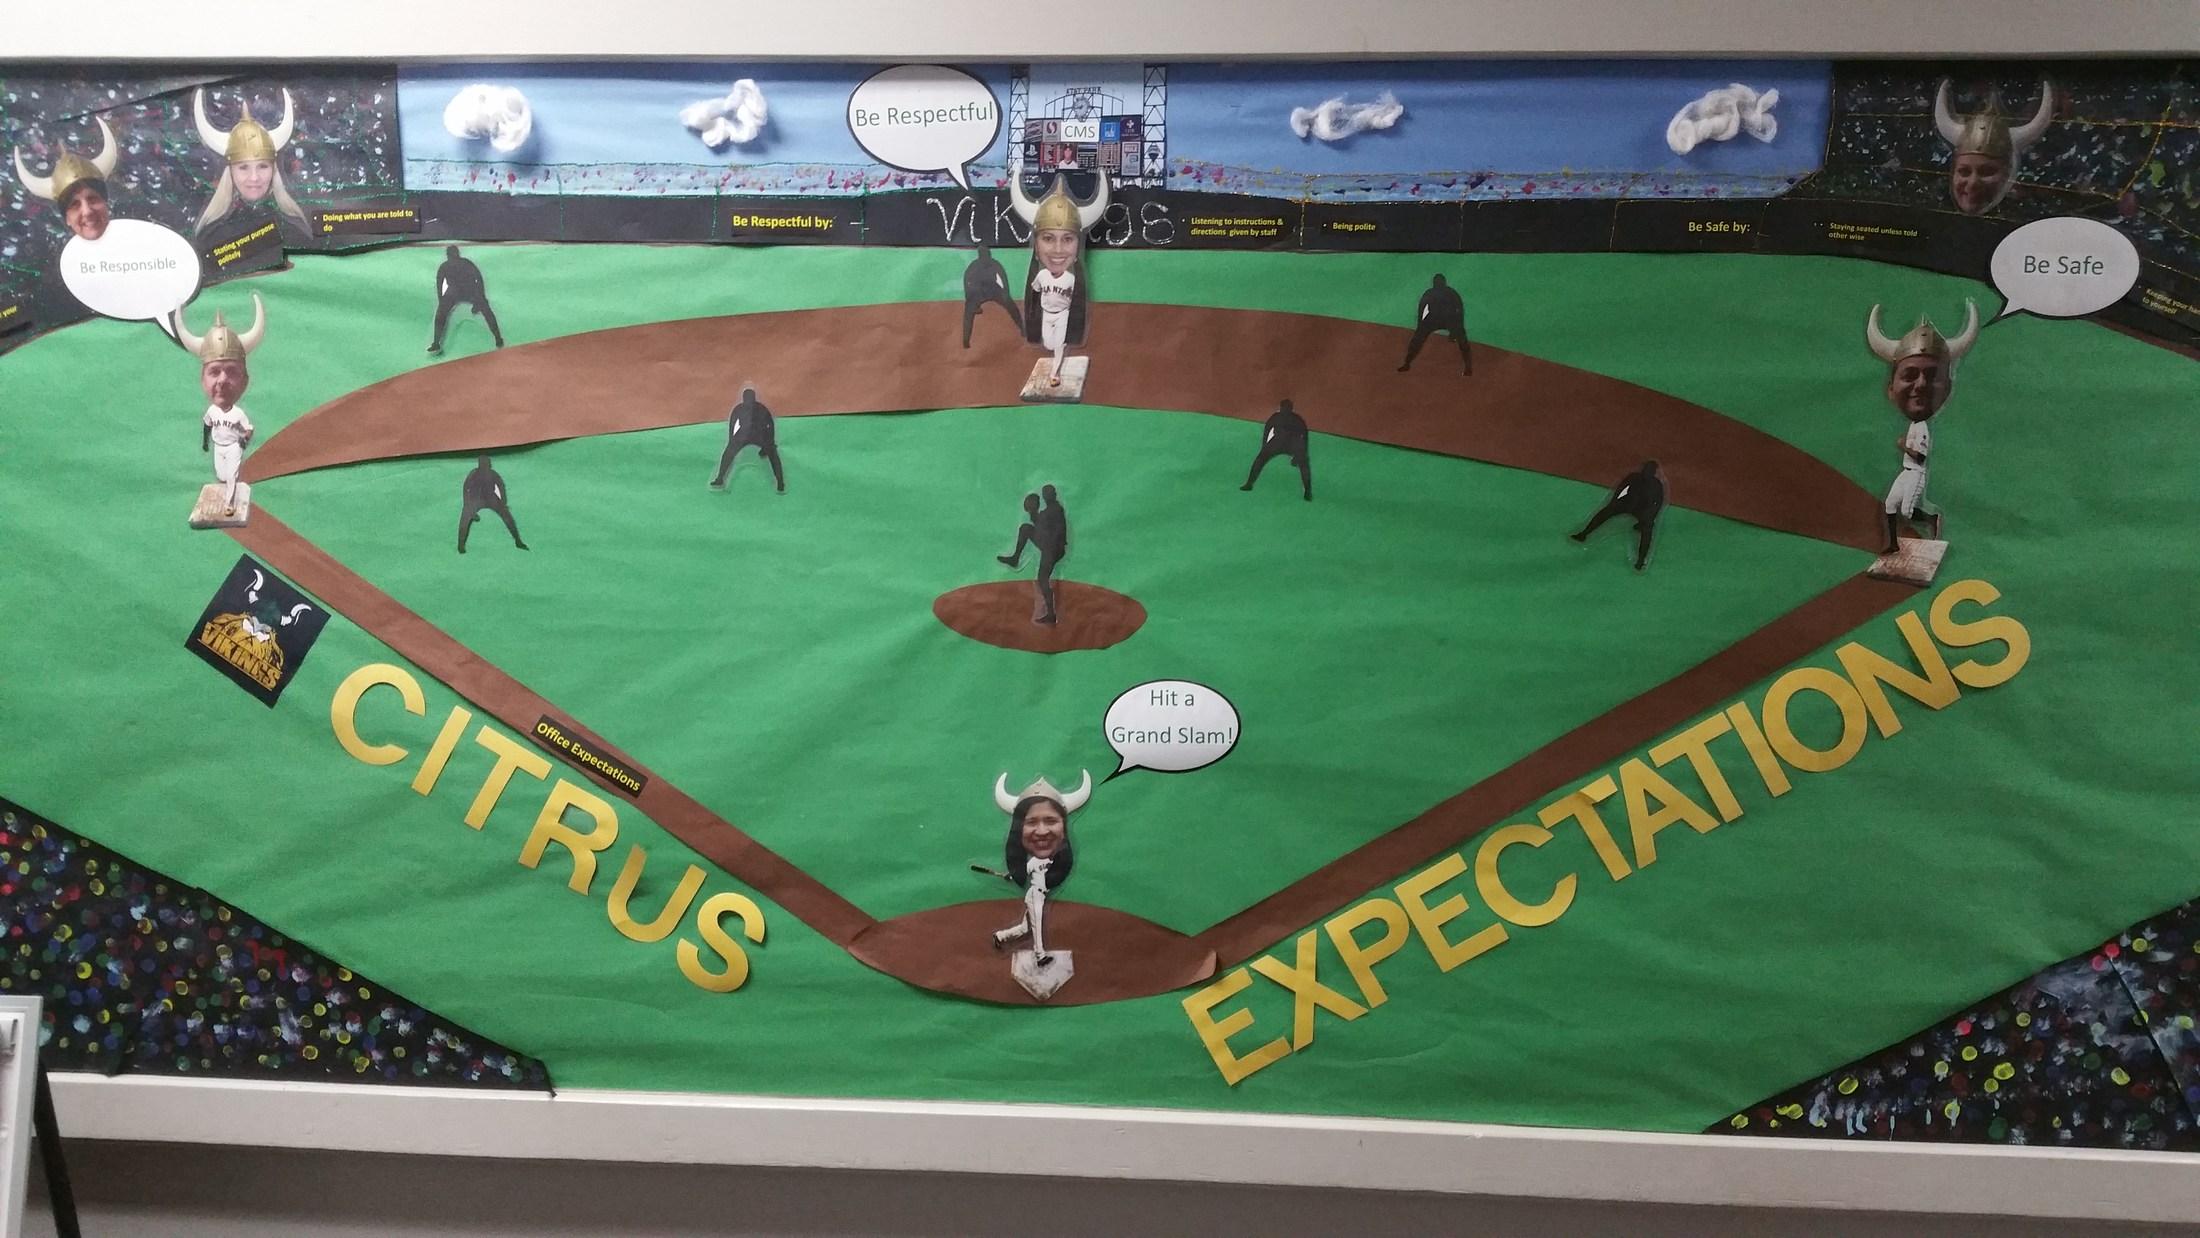 Citrus Expectations- Baseball Diamond Format